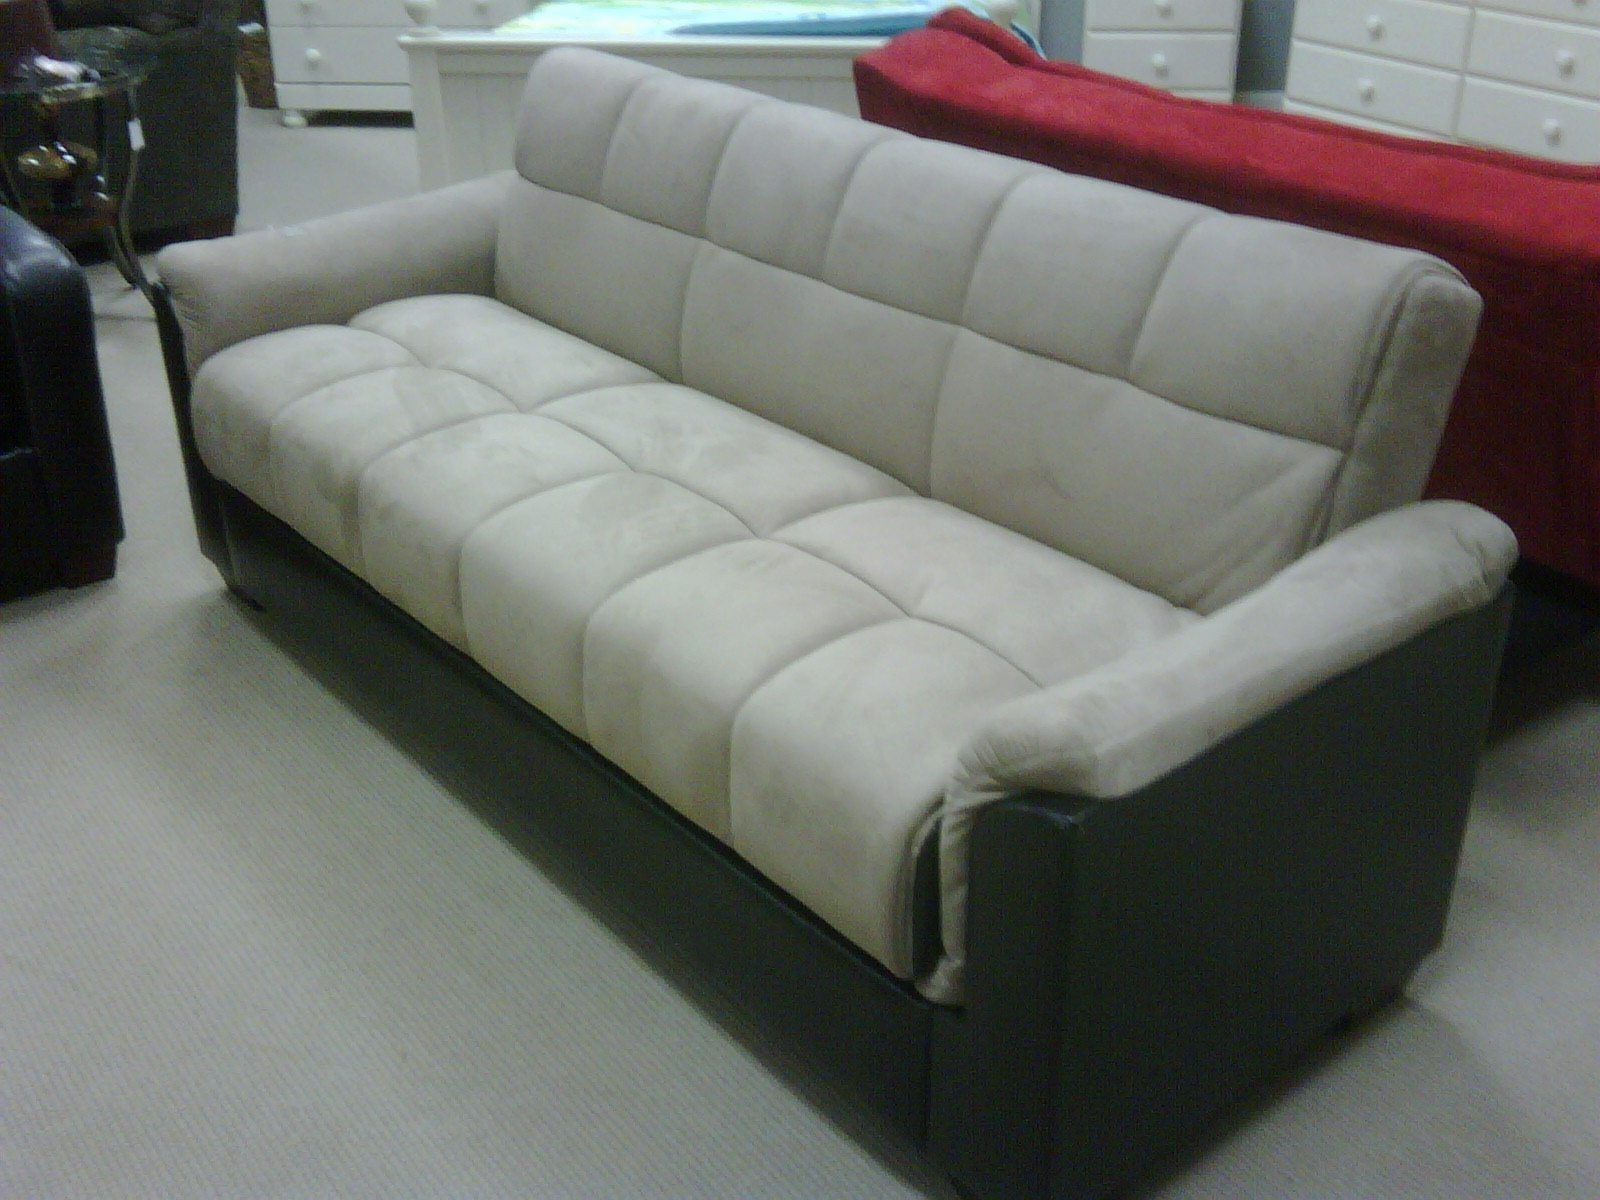 Divan Lit Ikea Charmant Divan Lit Ikea Beau Interior 50 Inspirational Ikea sofa Ideas Ikea